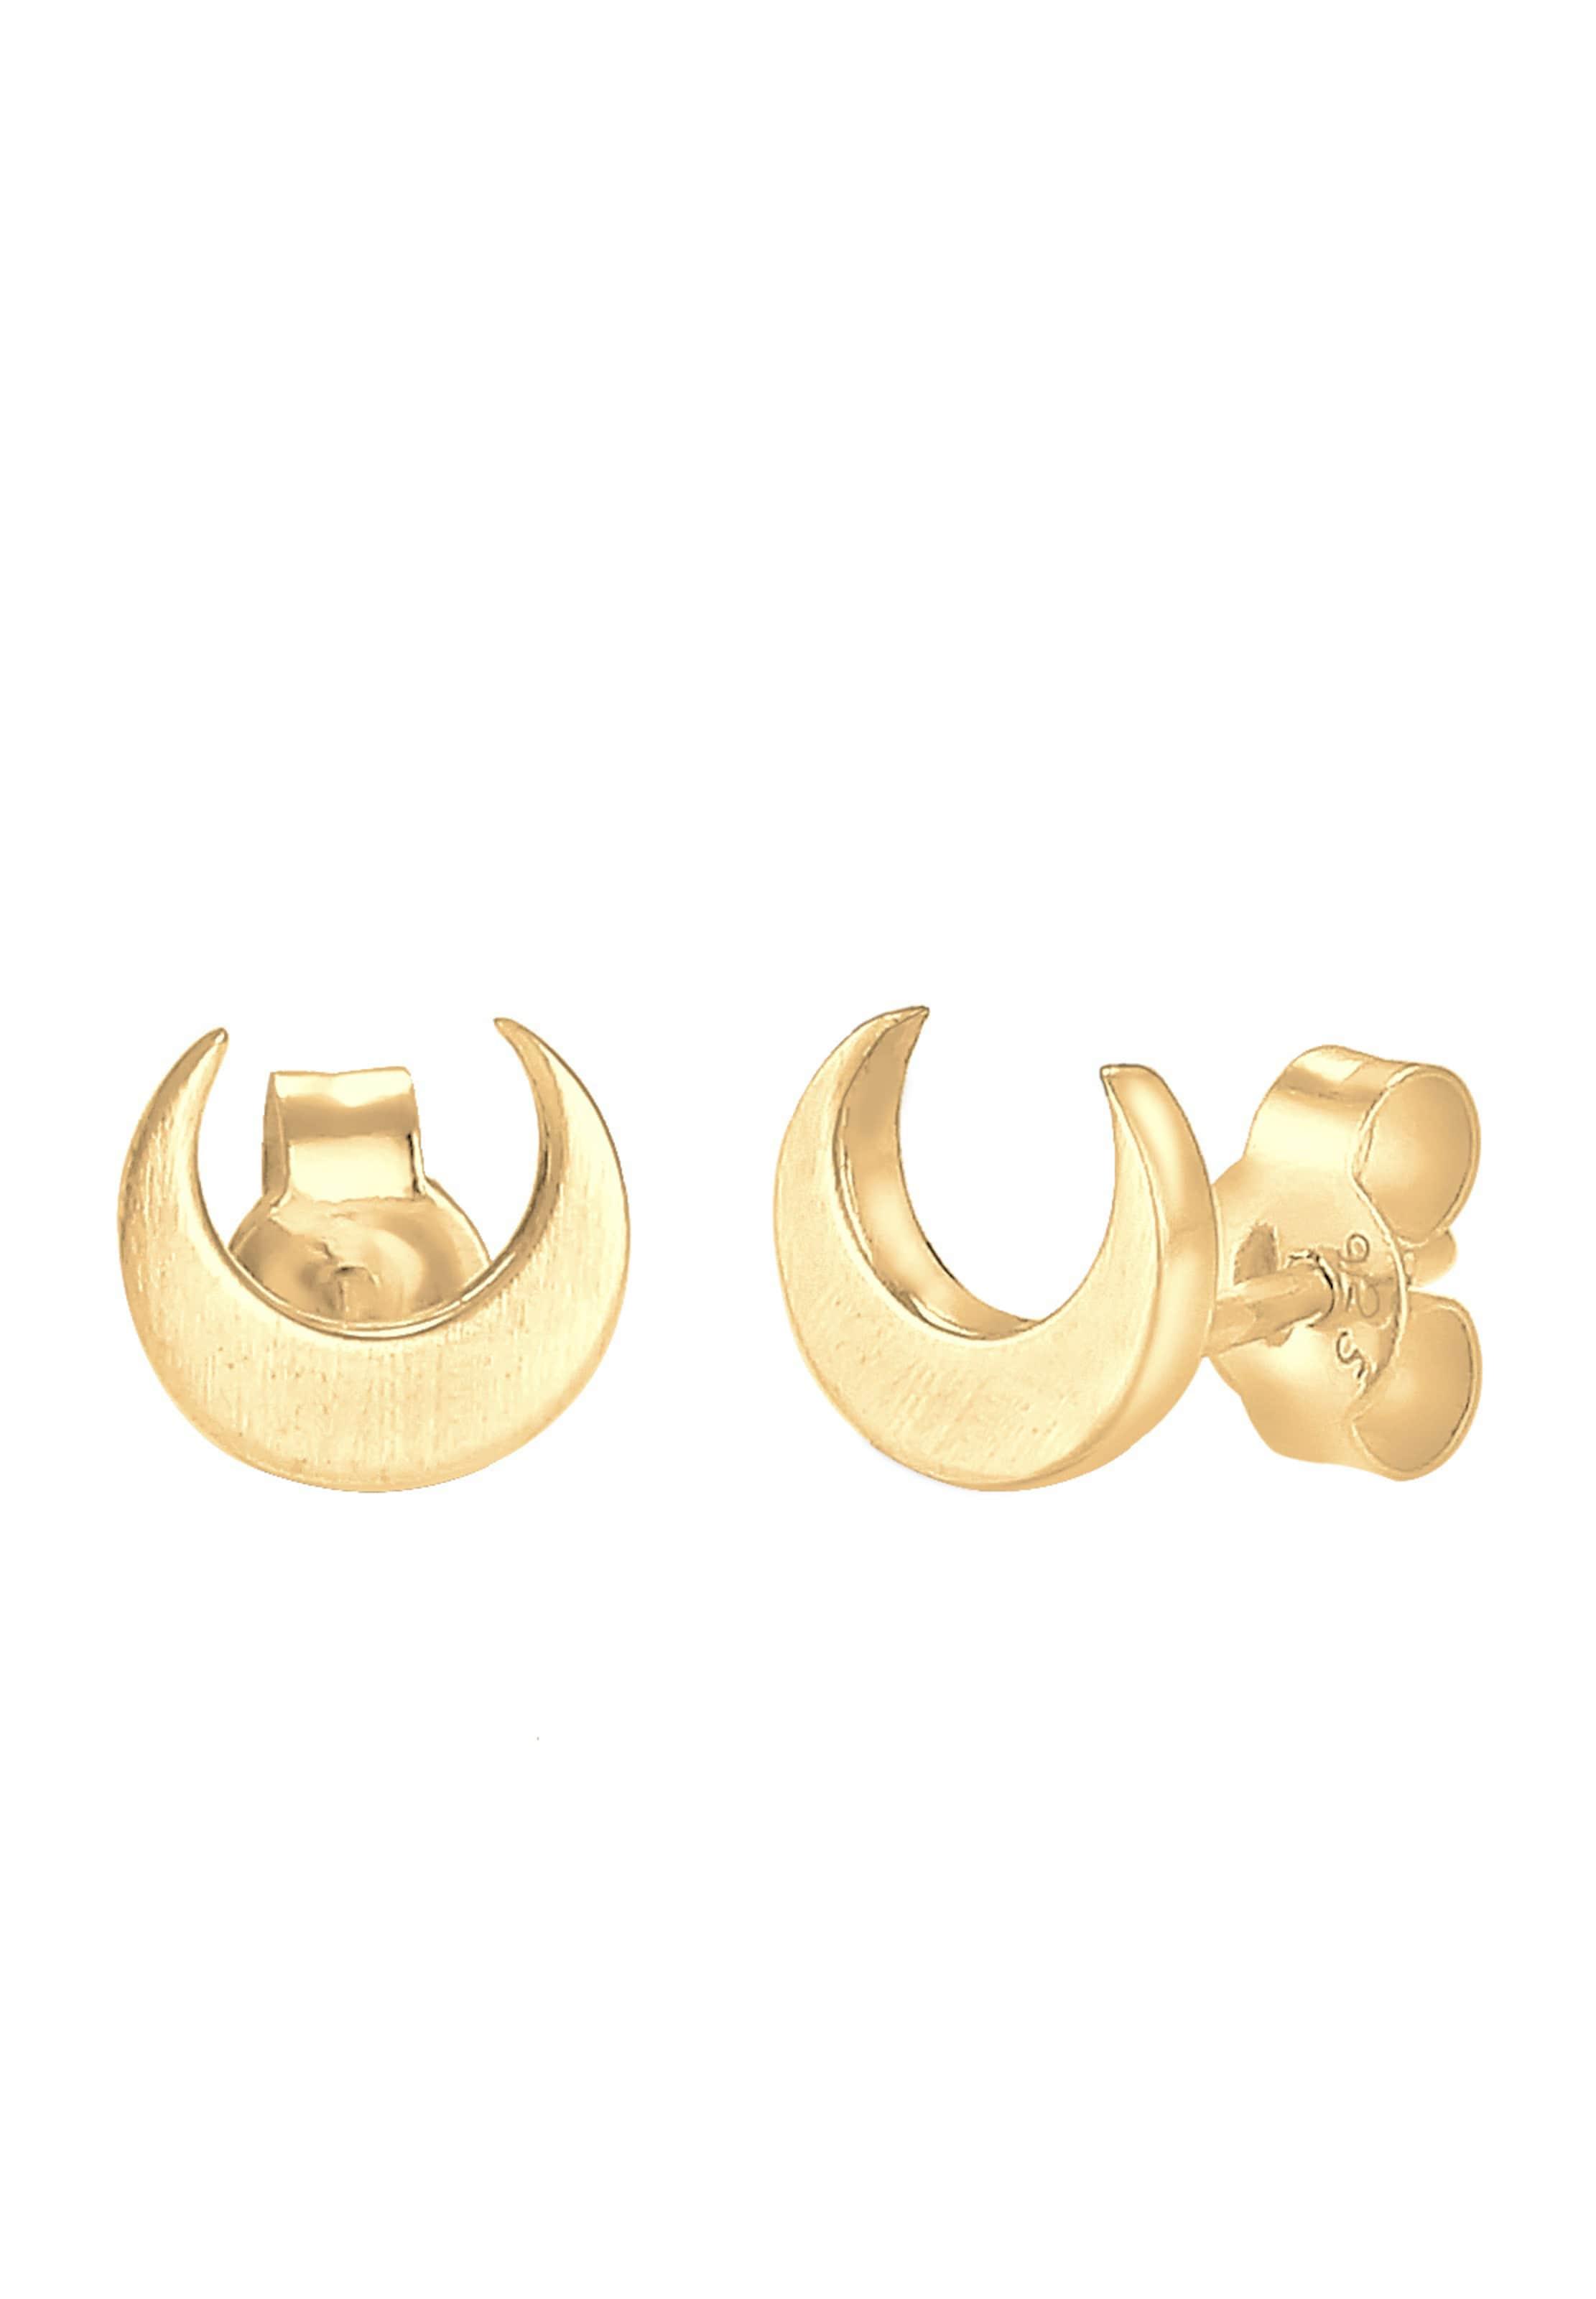 Gold Gold Elli In 'halbmond' Ohrringe Ohrringe Elli 'halbmond' Ohrringe 'halbmond' Elli In 9YW2DEHI